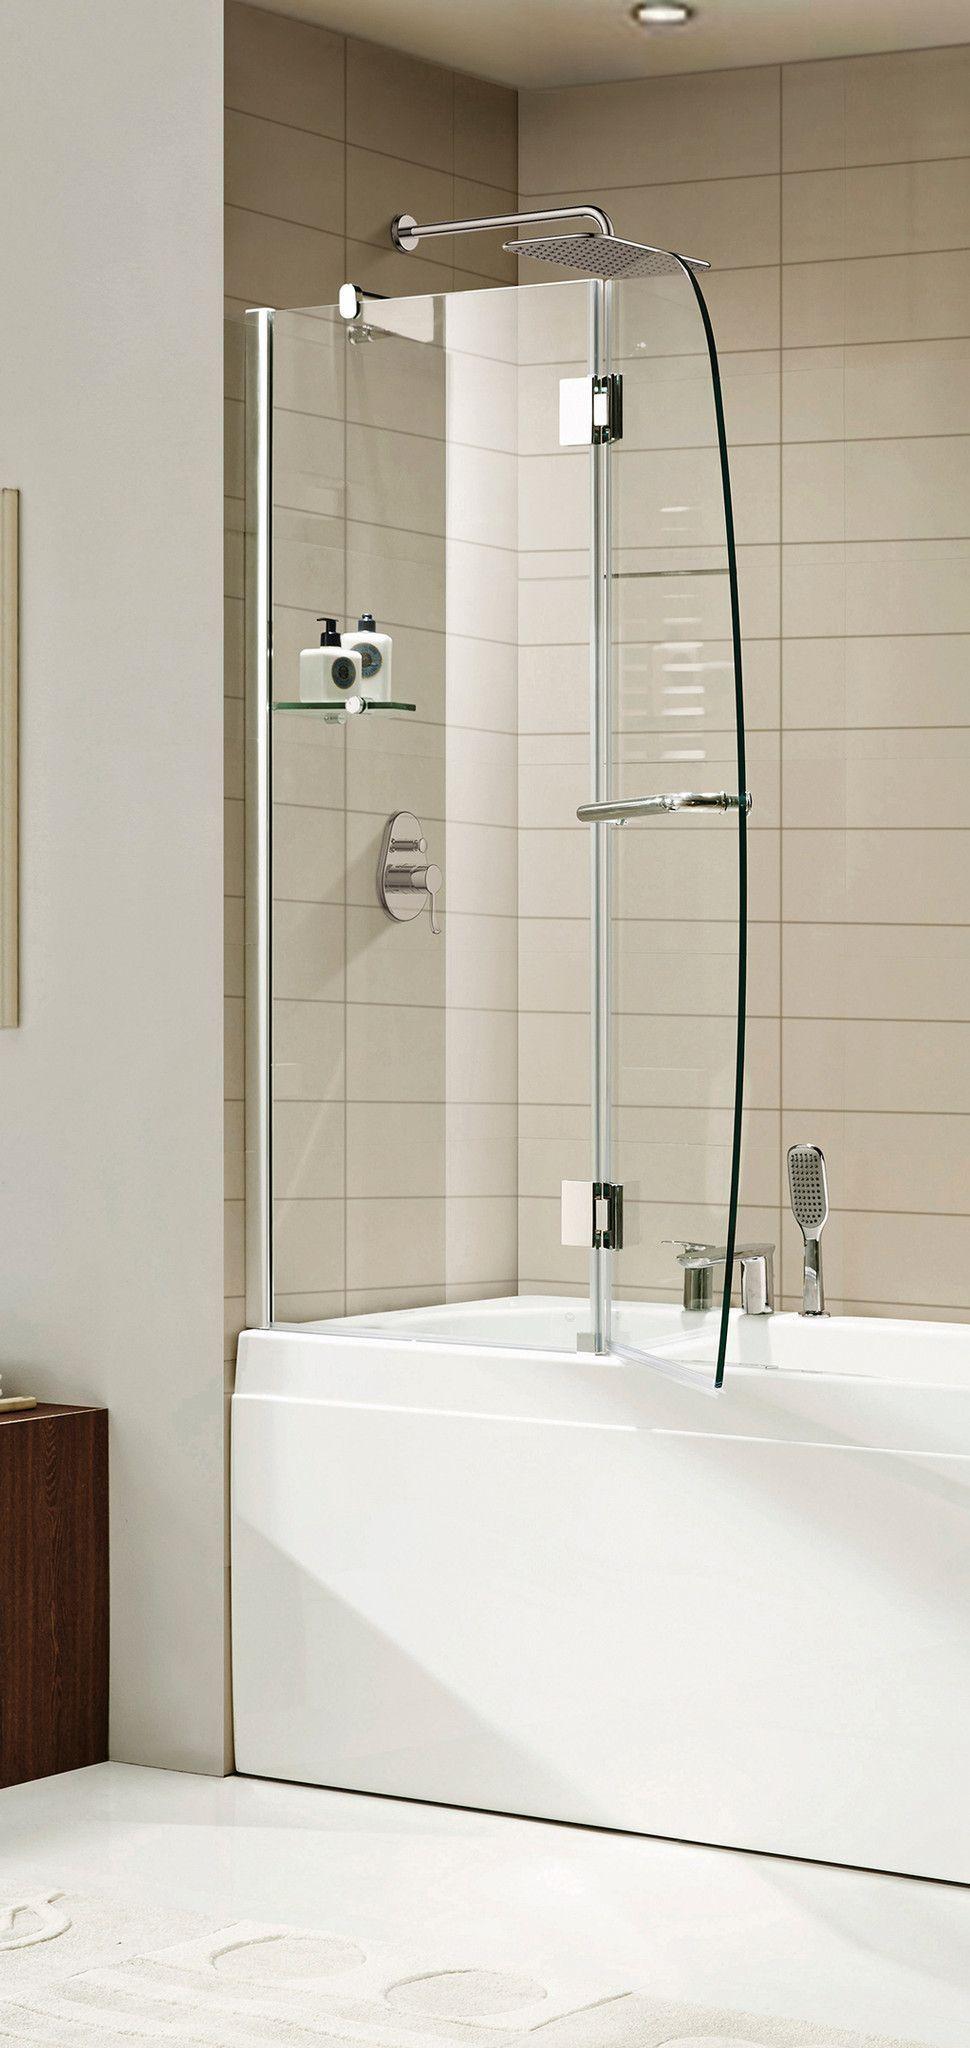 Paragon Bath Aurora E Frameless Shower Door In Chrome, Size 48